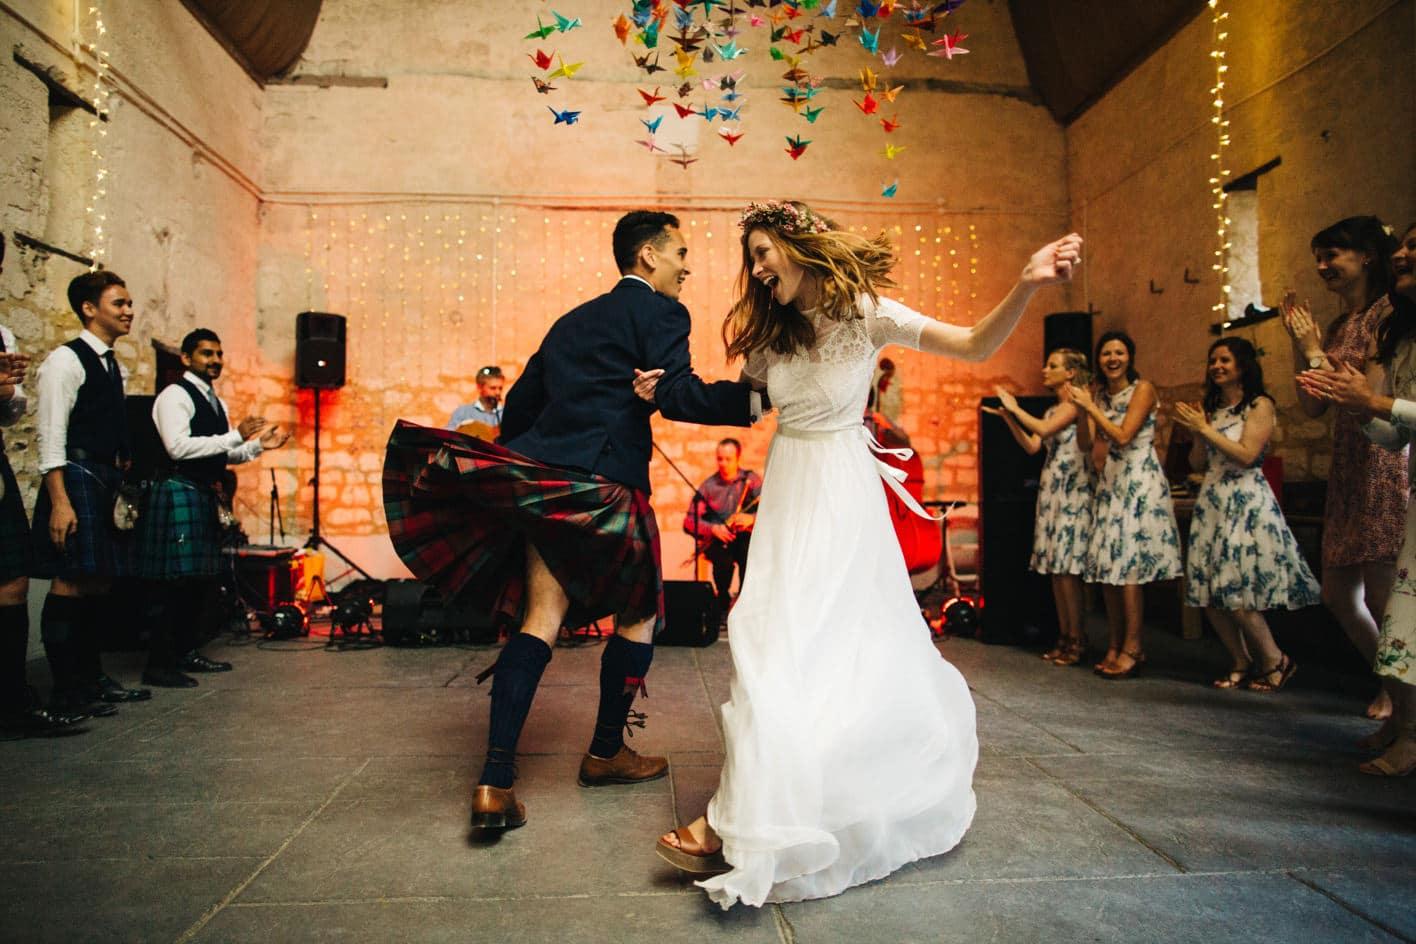 bride and groom ceilidh dancing